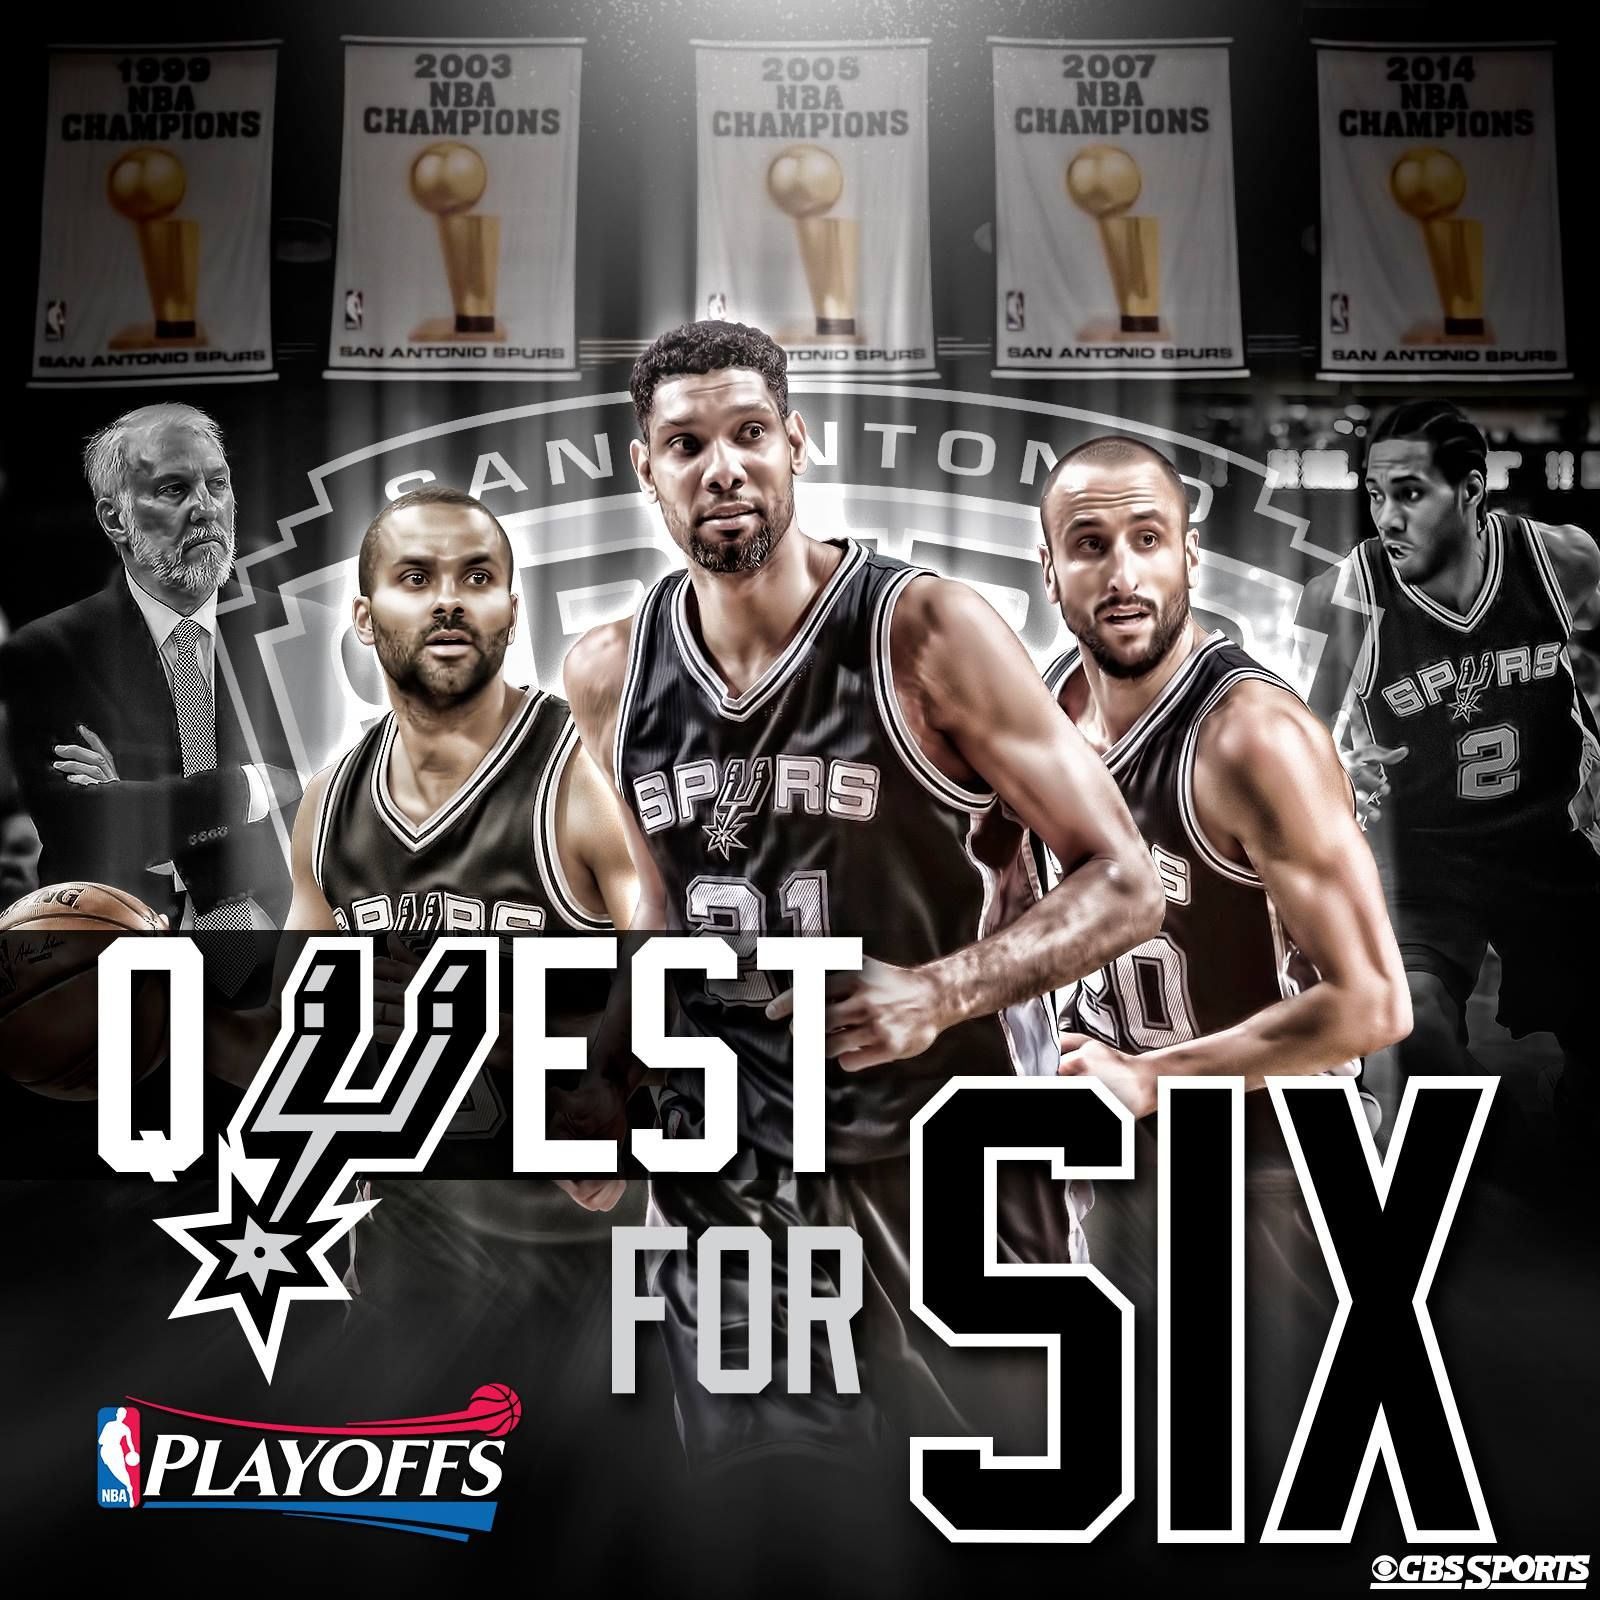 Quest for Six starts tonight April 19 2015. Go Spurs Go